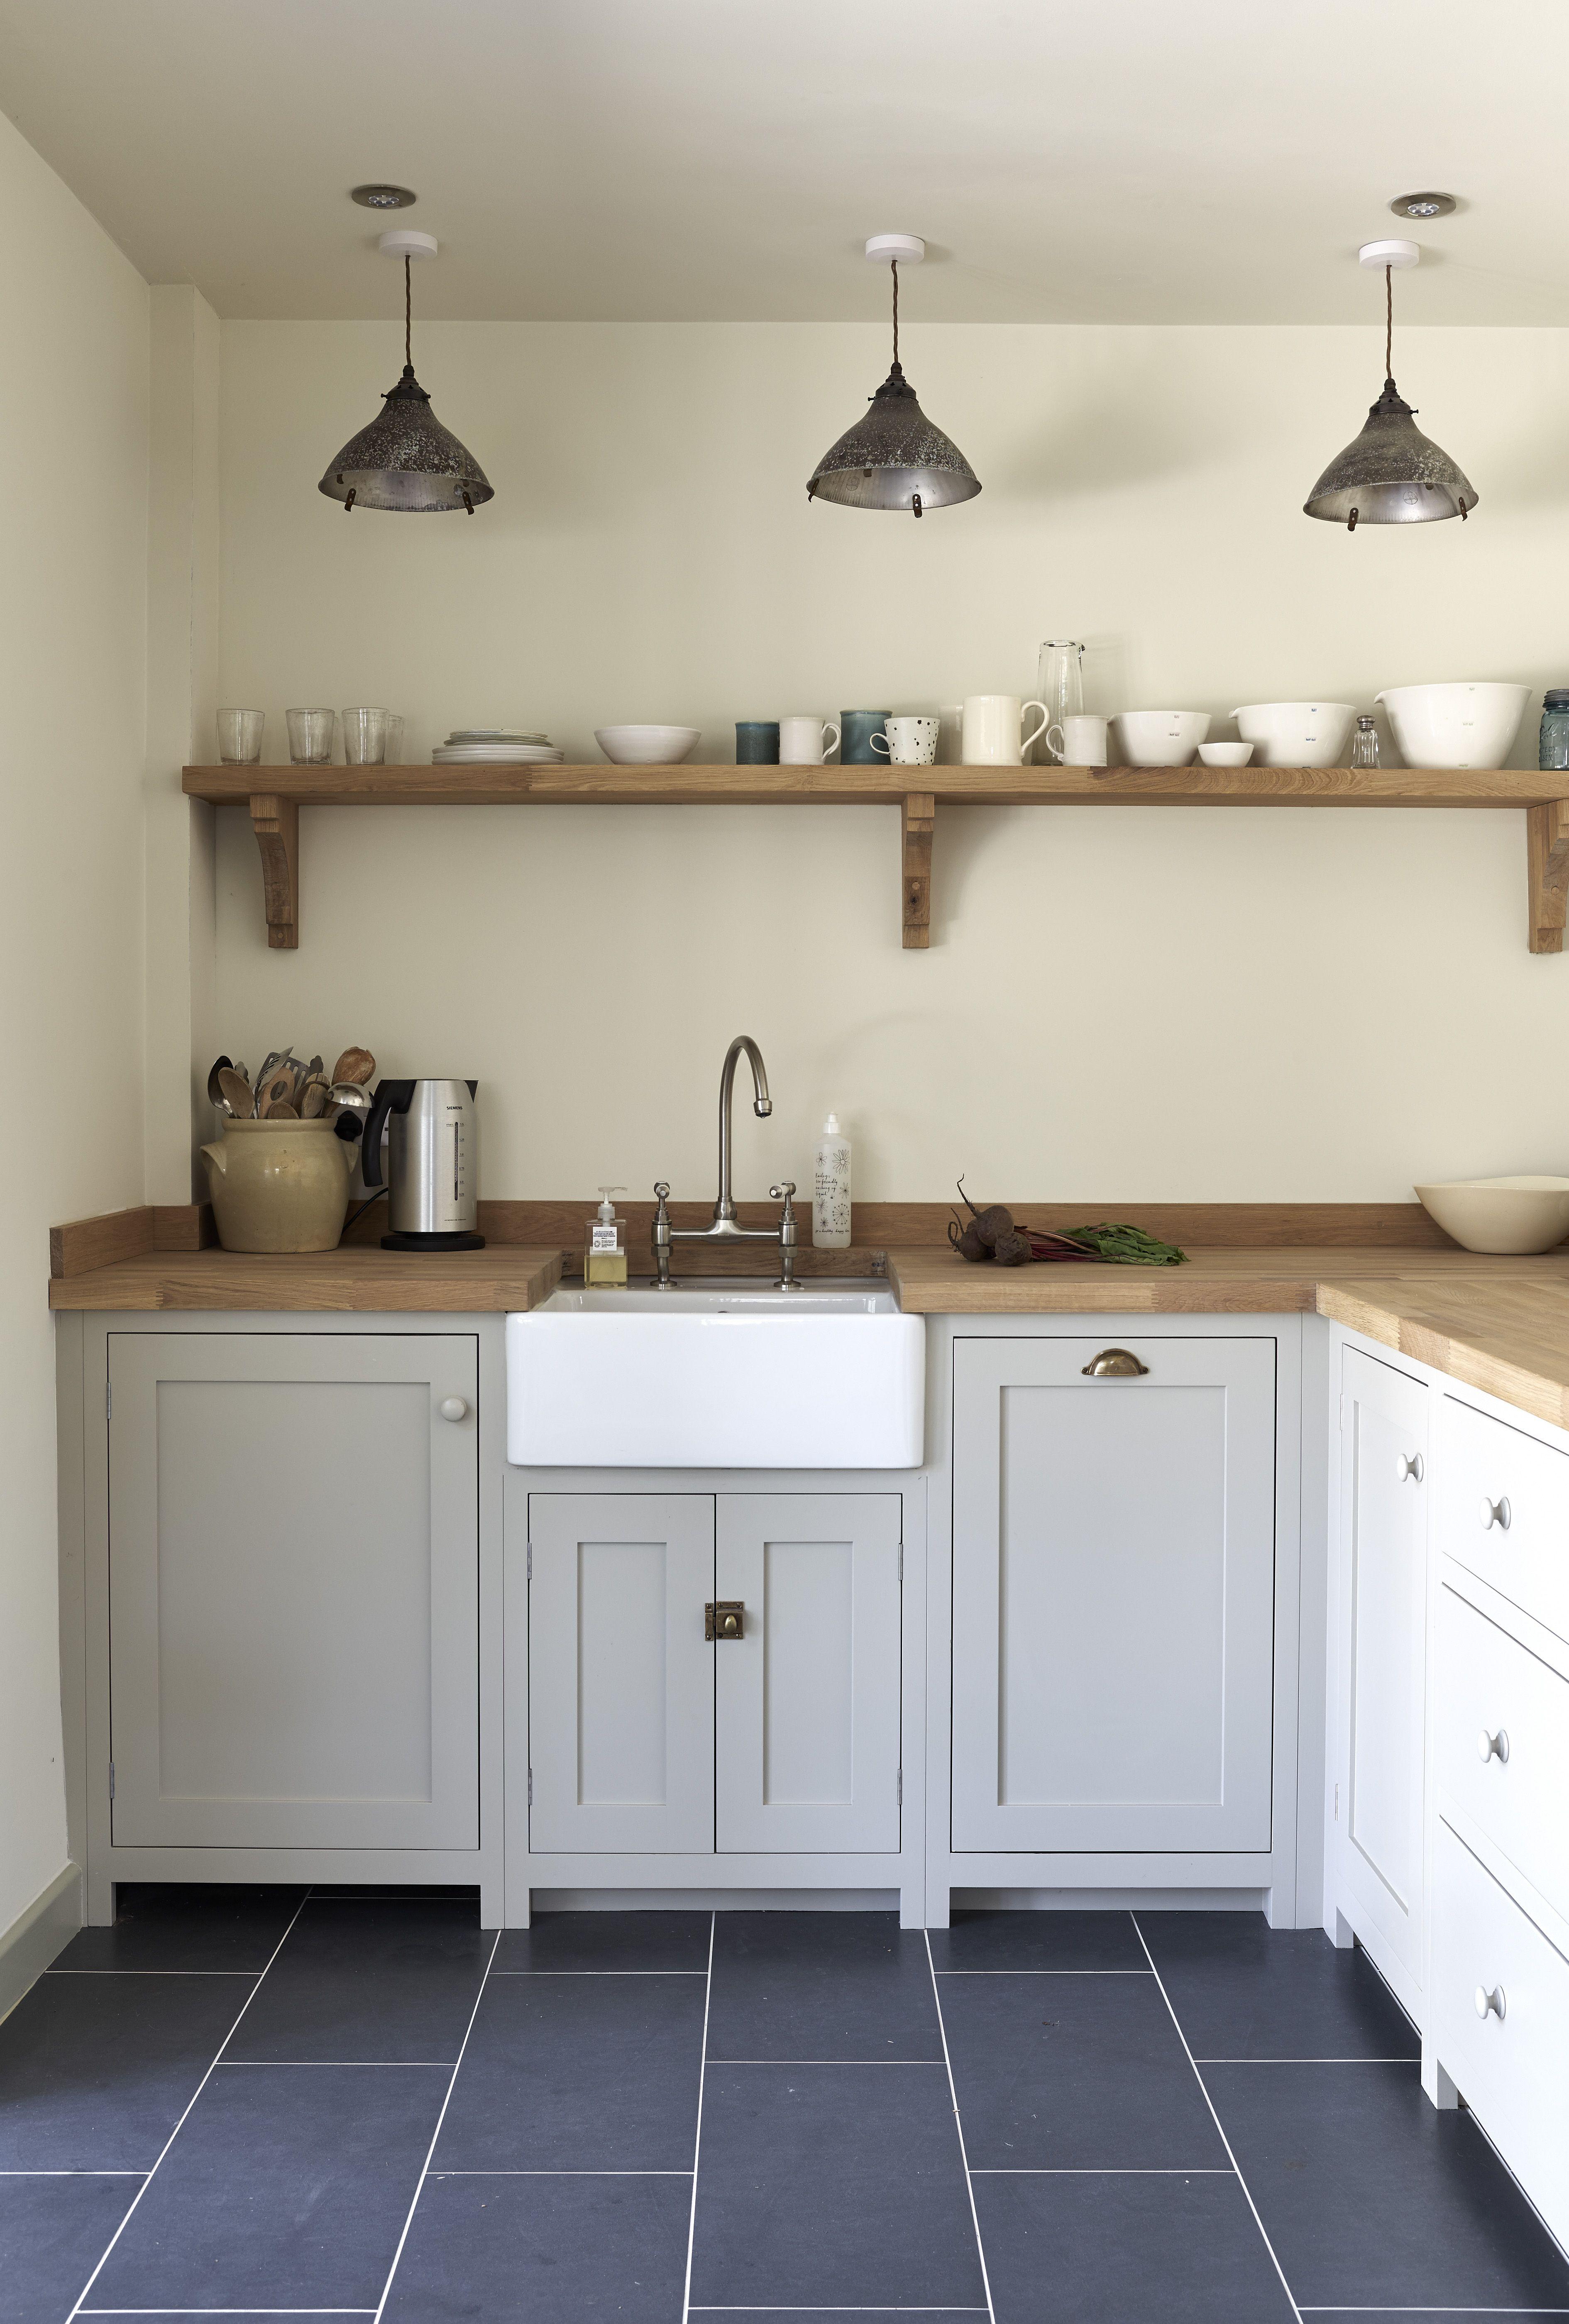 Slate Floor Tiles Kitchen Slate Floor Tiles Kitchen - Fizzyinc.co